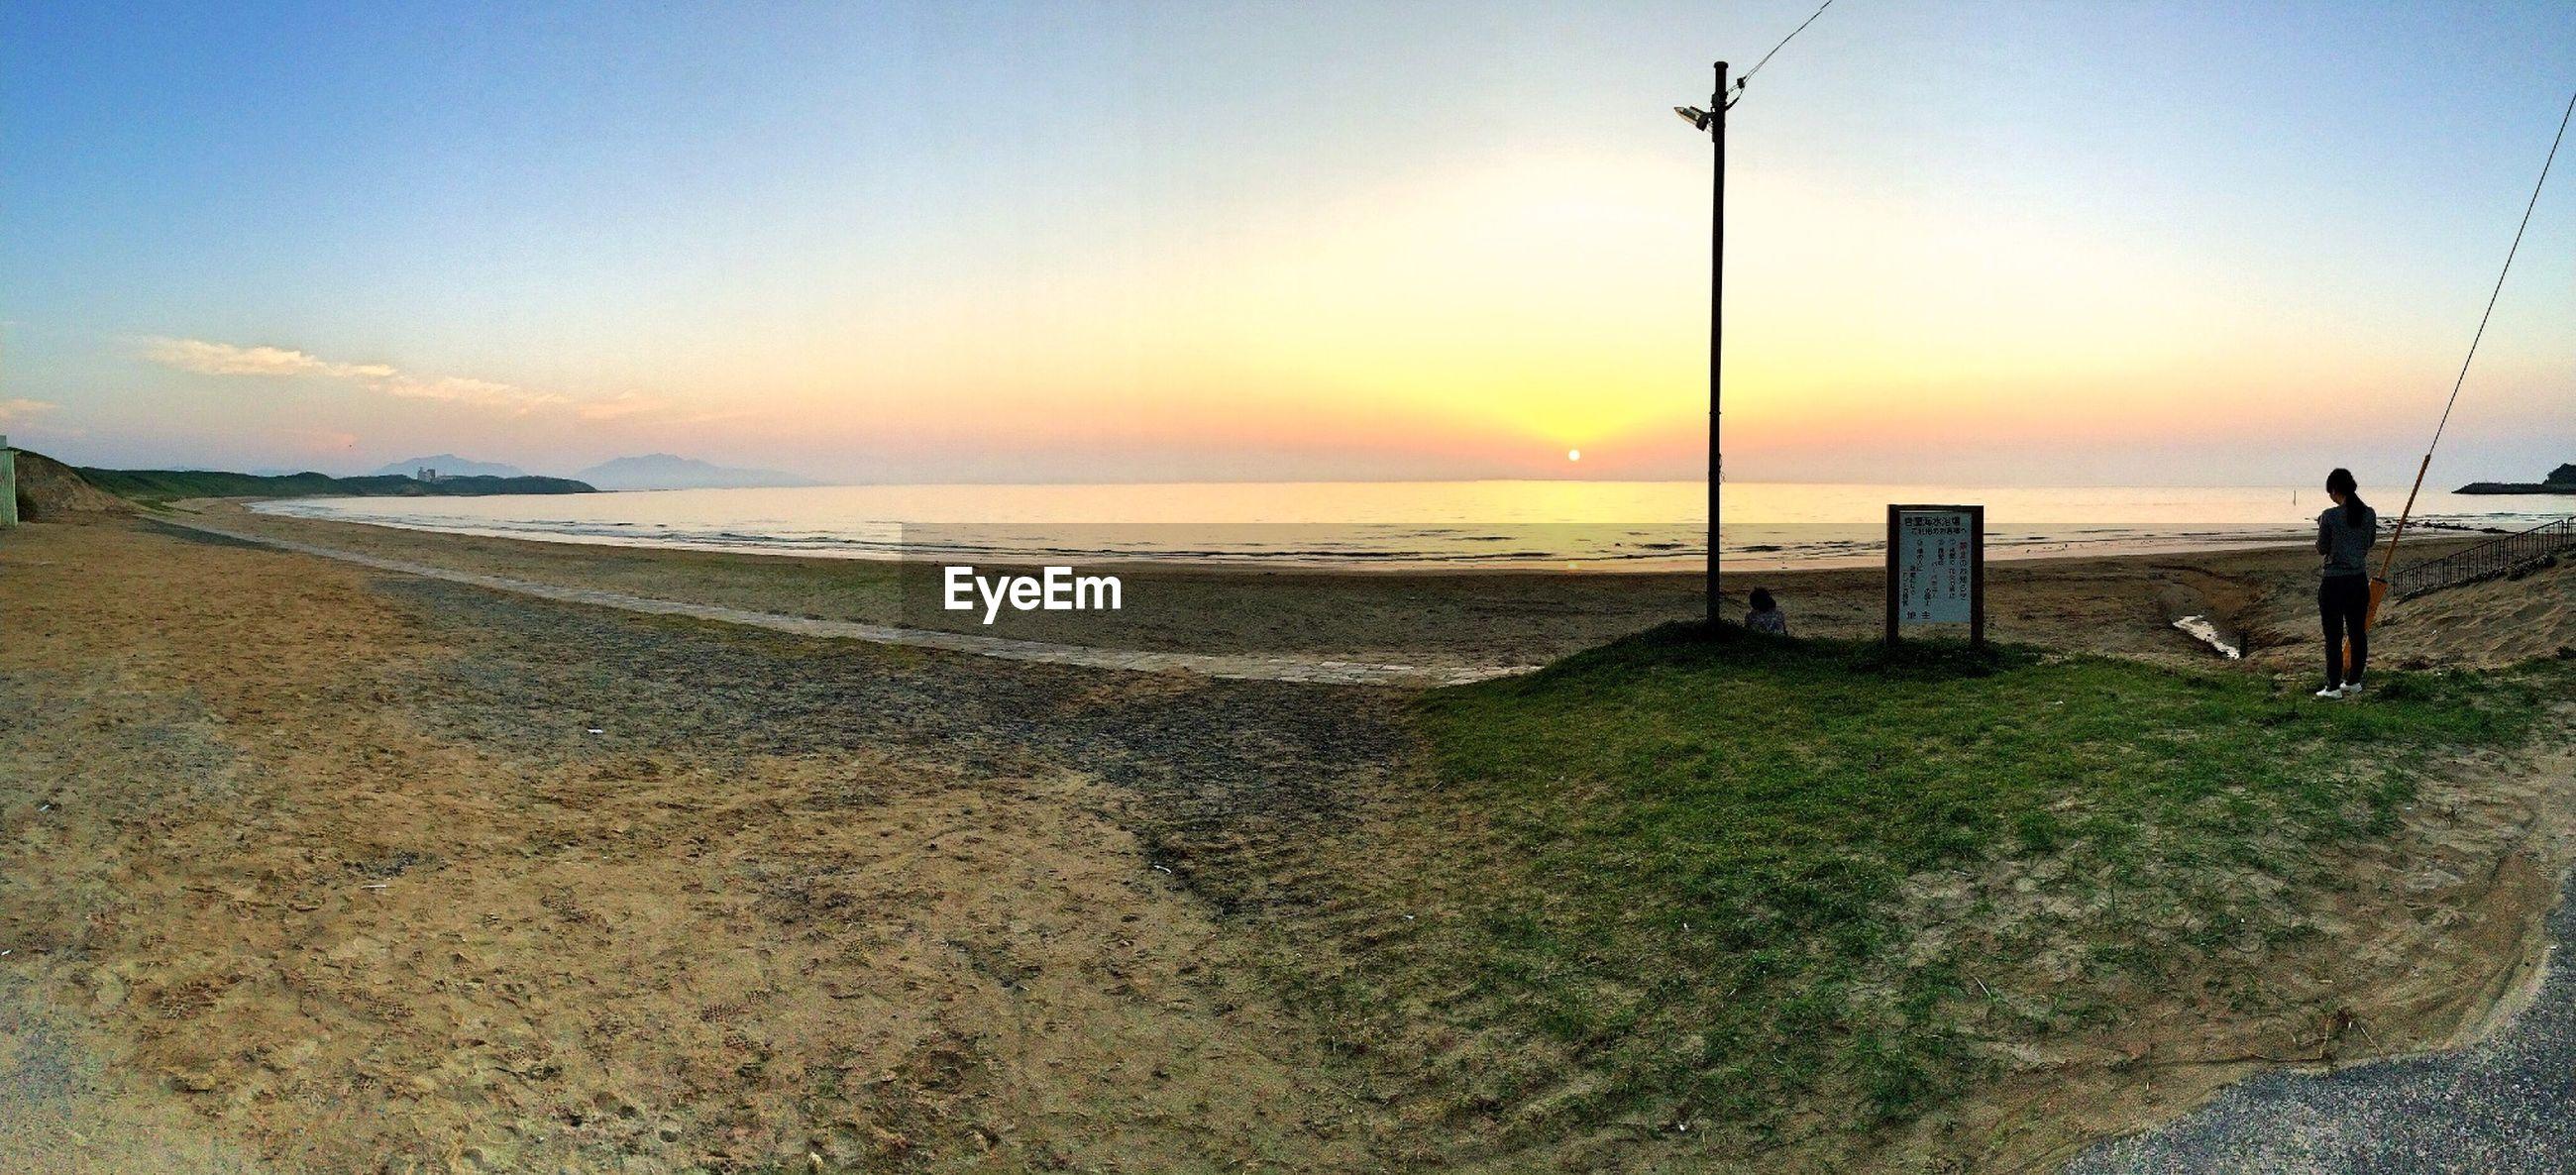 sea, horizon over water, beach, sunset, water, shore, tranquil scene, scenics, tranquility, beauty in nature, sky, orange color, sand, idyllic, nature, sun, coastline, sunlight, incidental people, outdoors